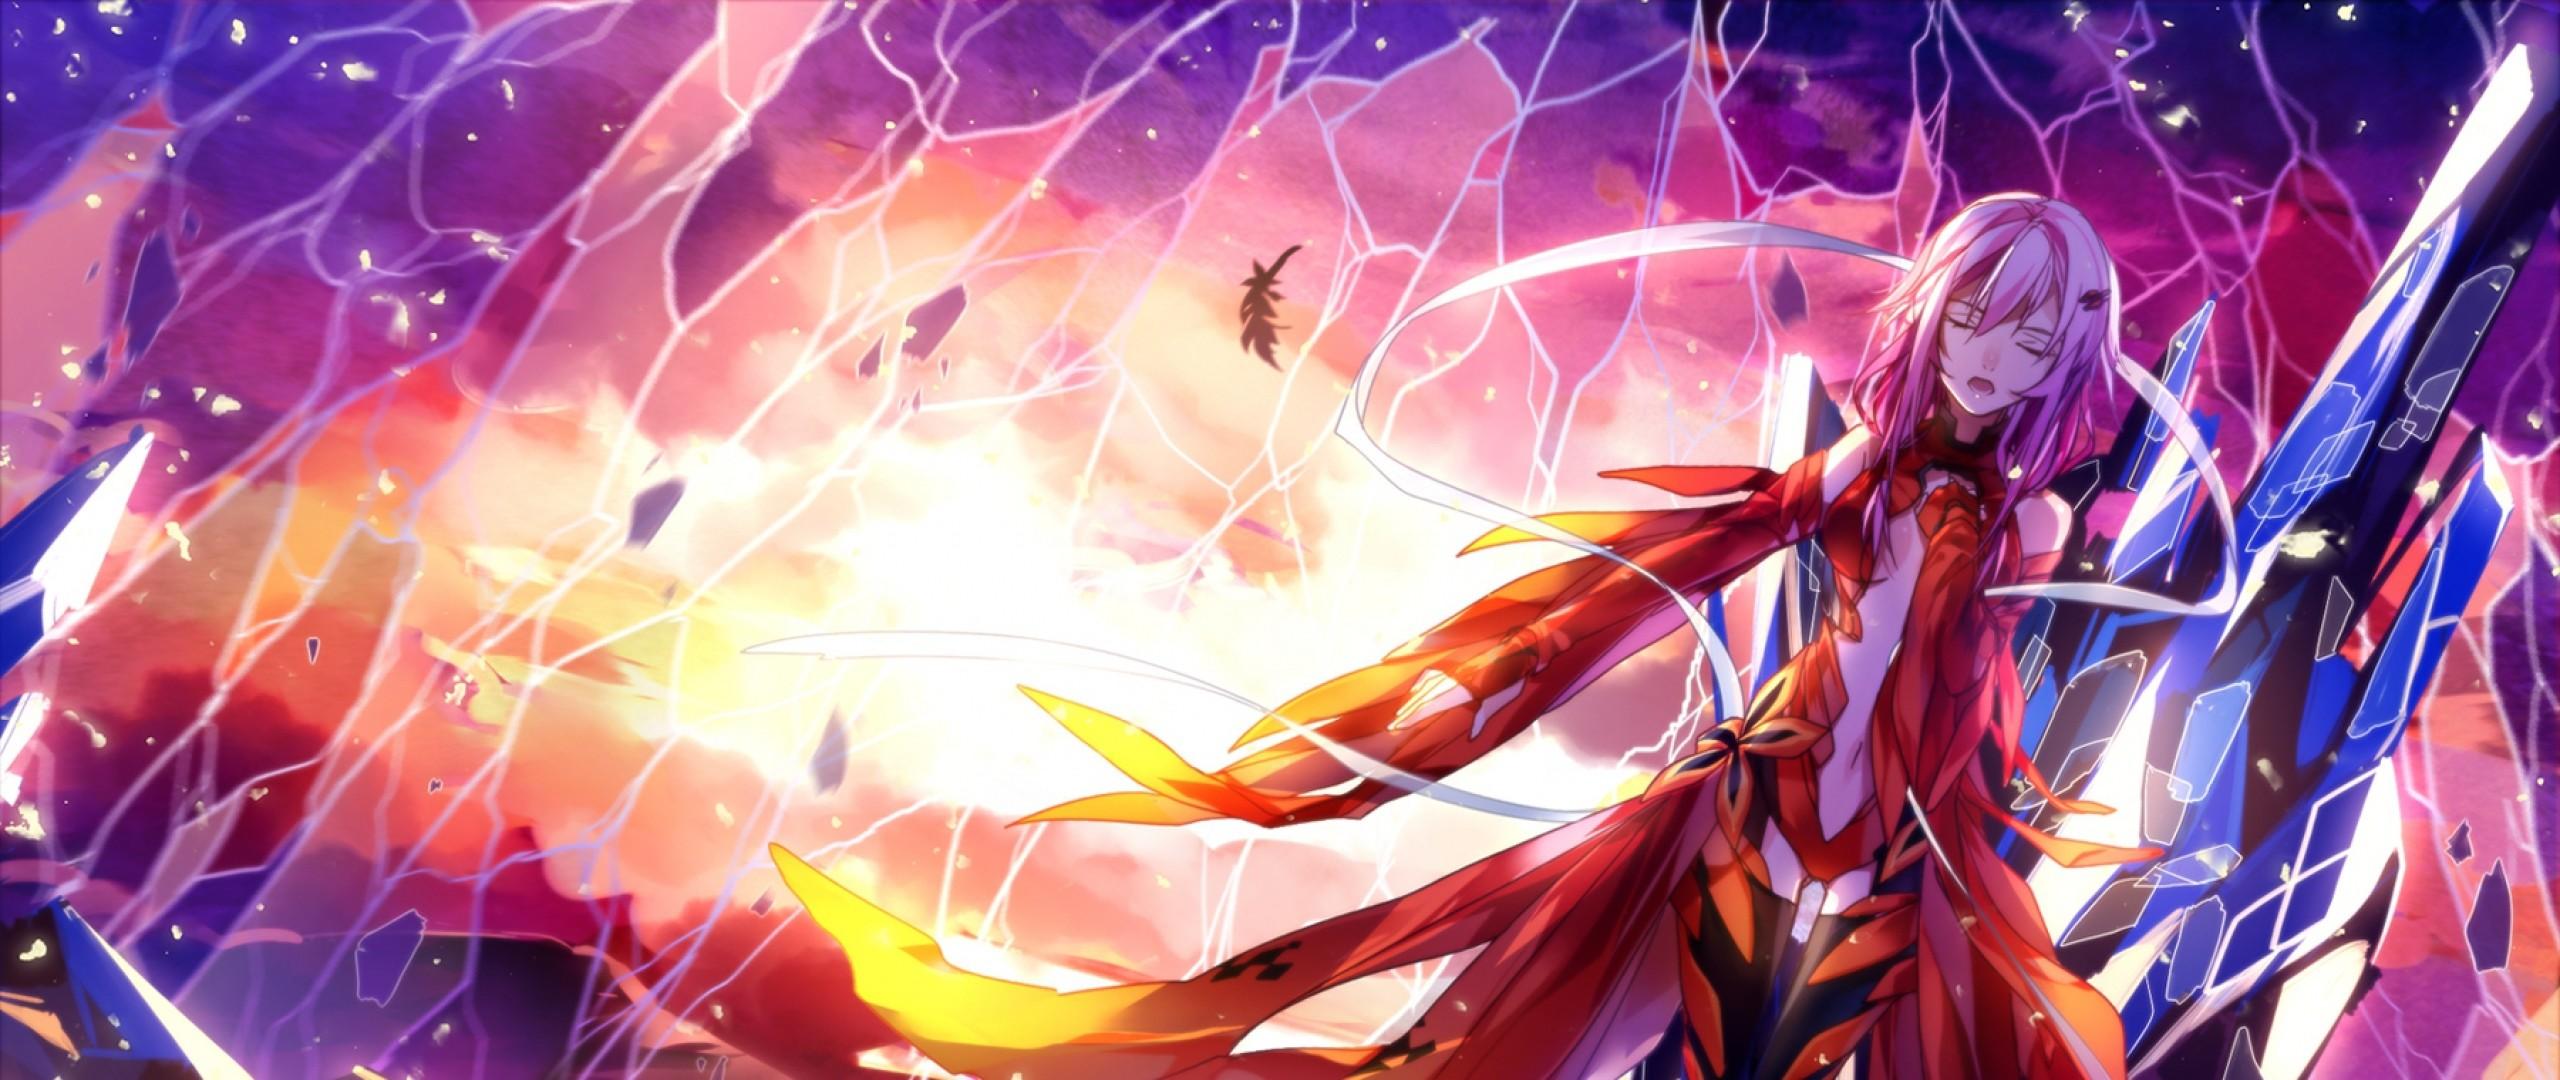 Download Wallpaper Guilty crown, Anime, Inori 21:9 .